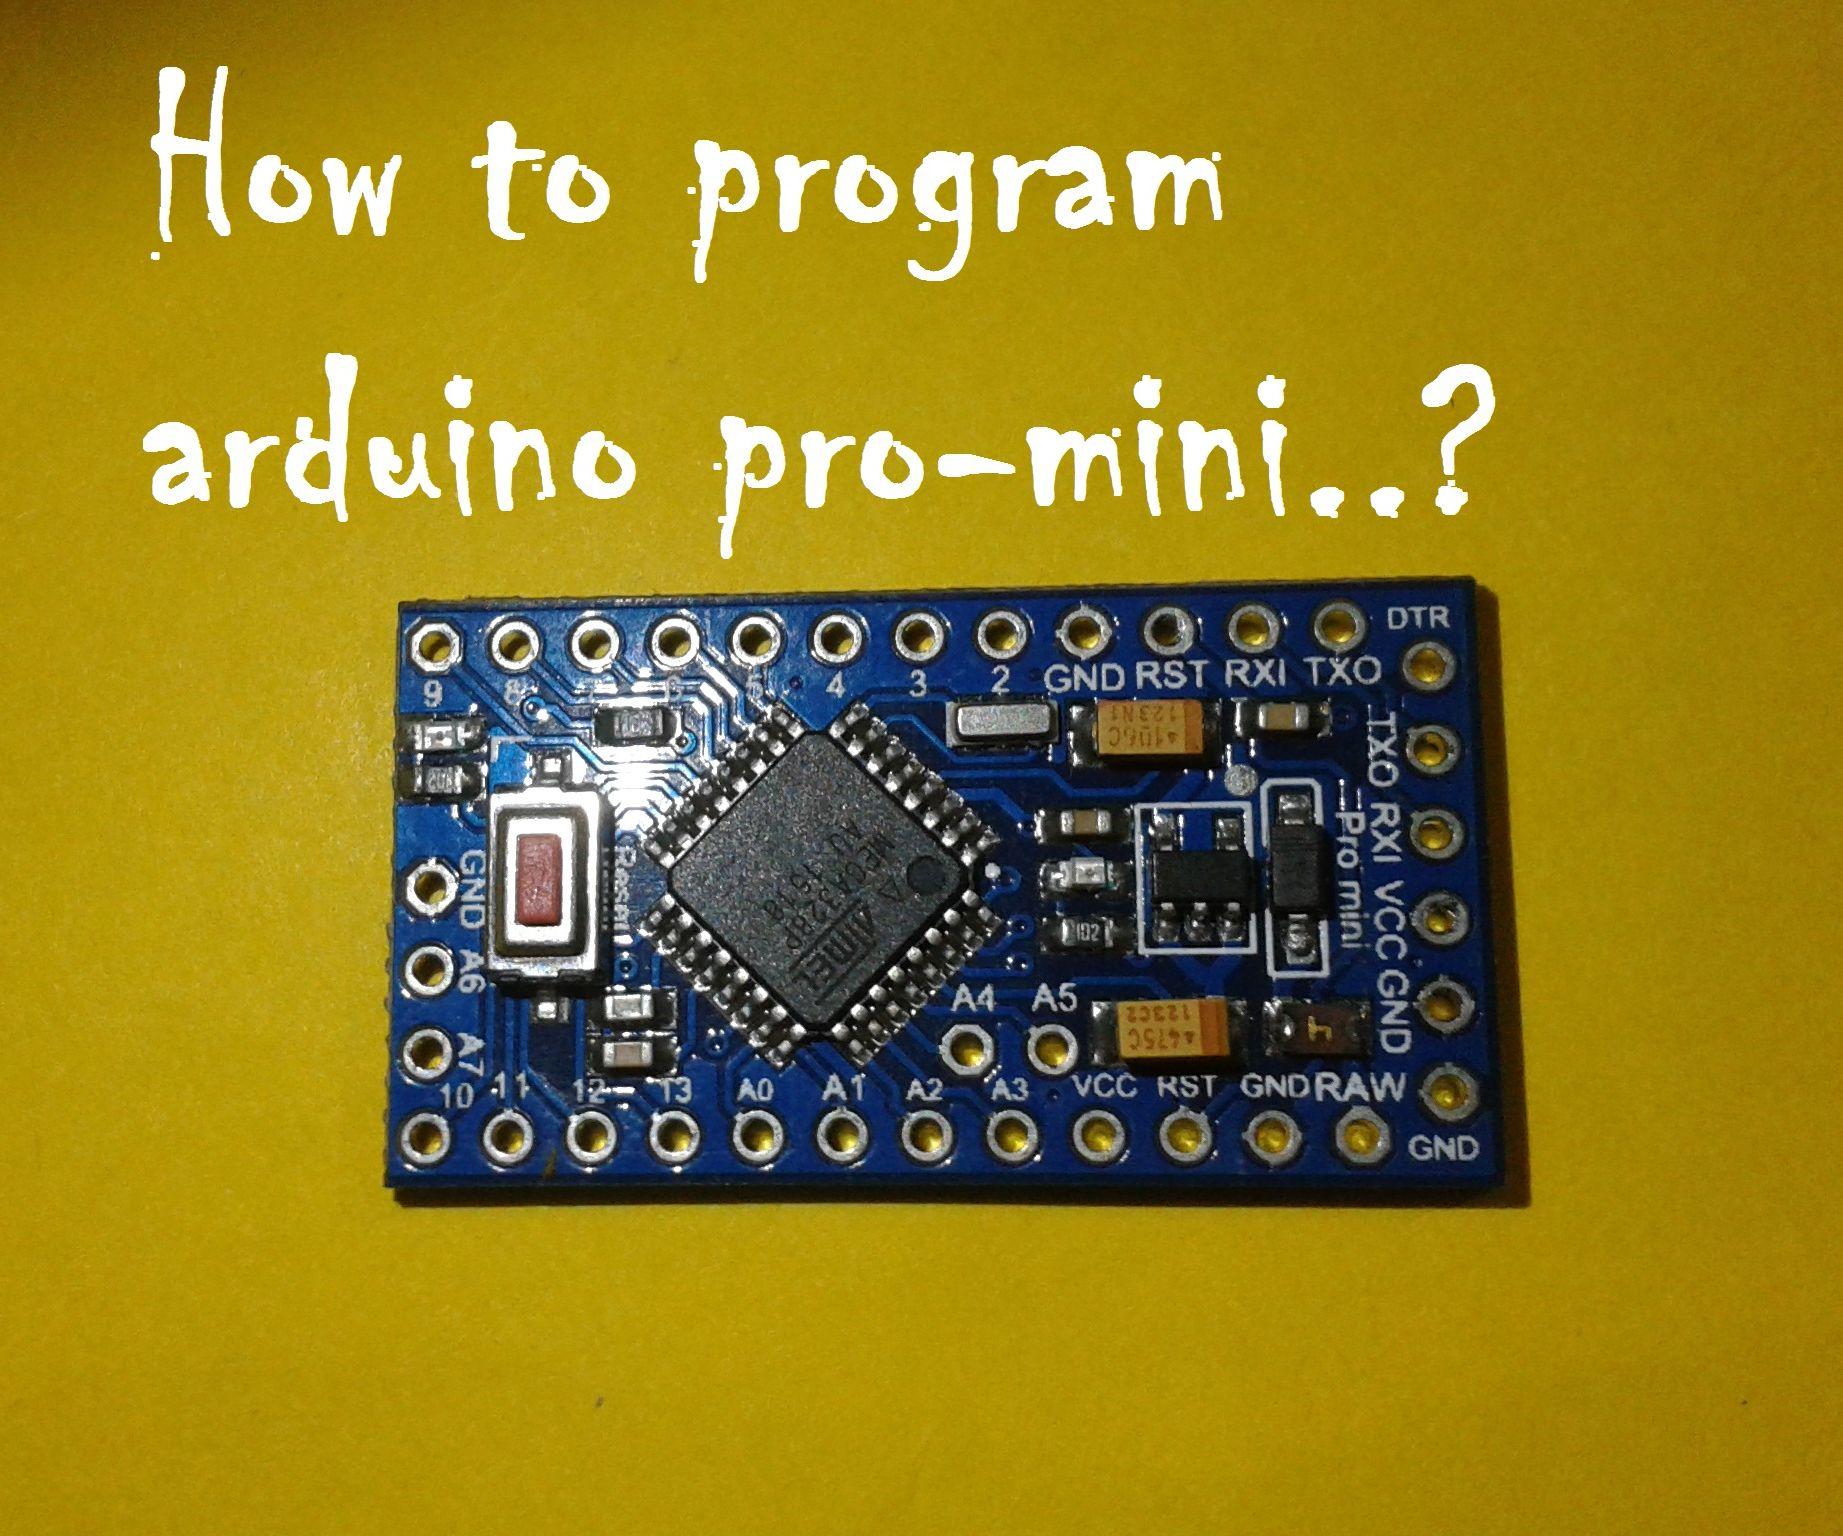 Program Pro-mini Using Uno (Arduino Basics)